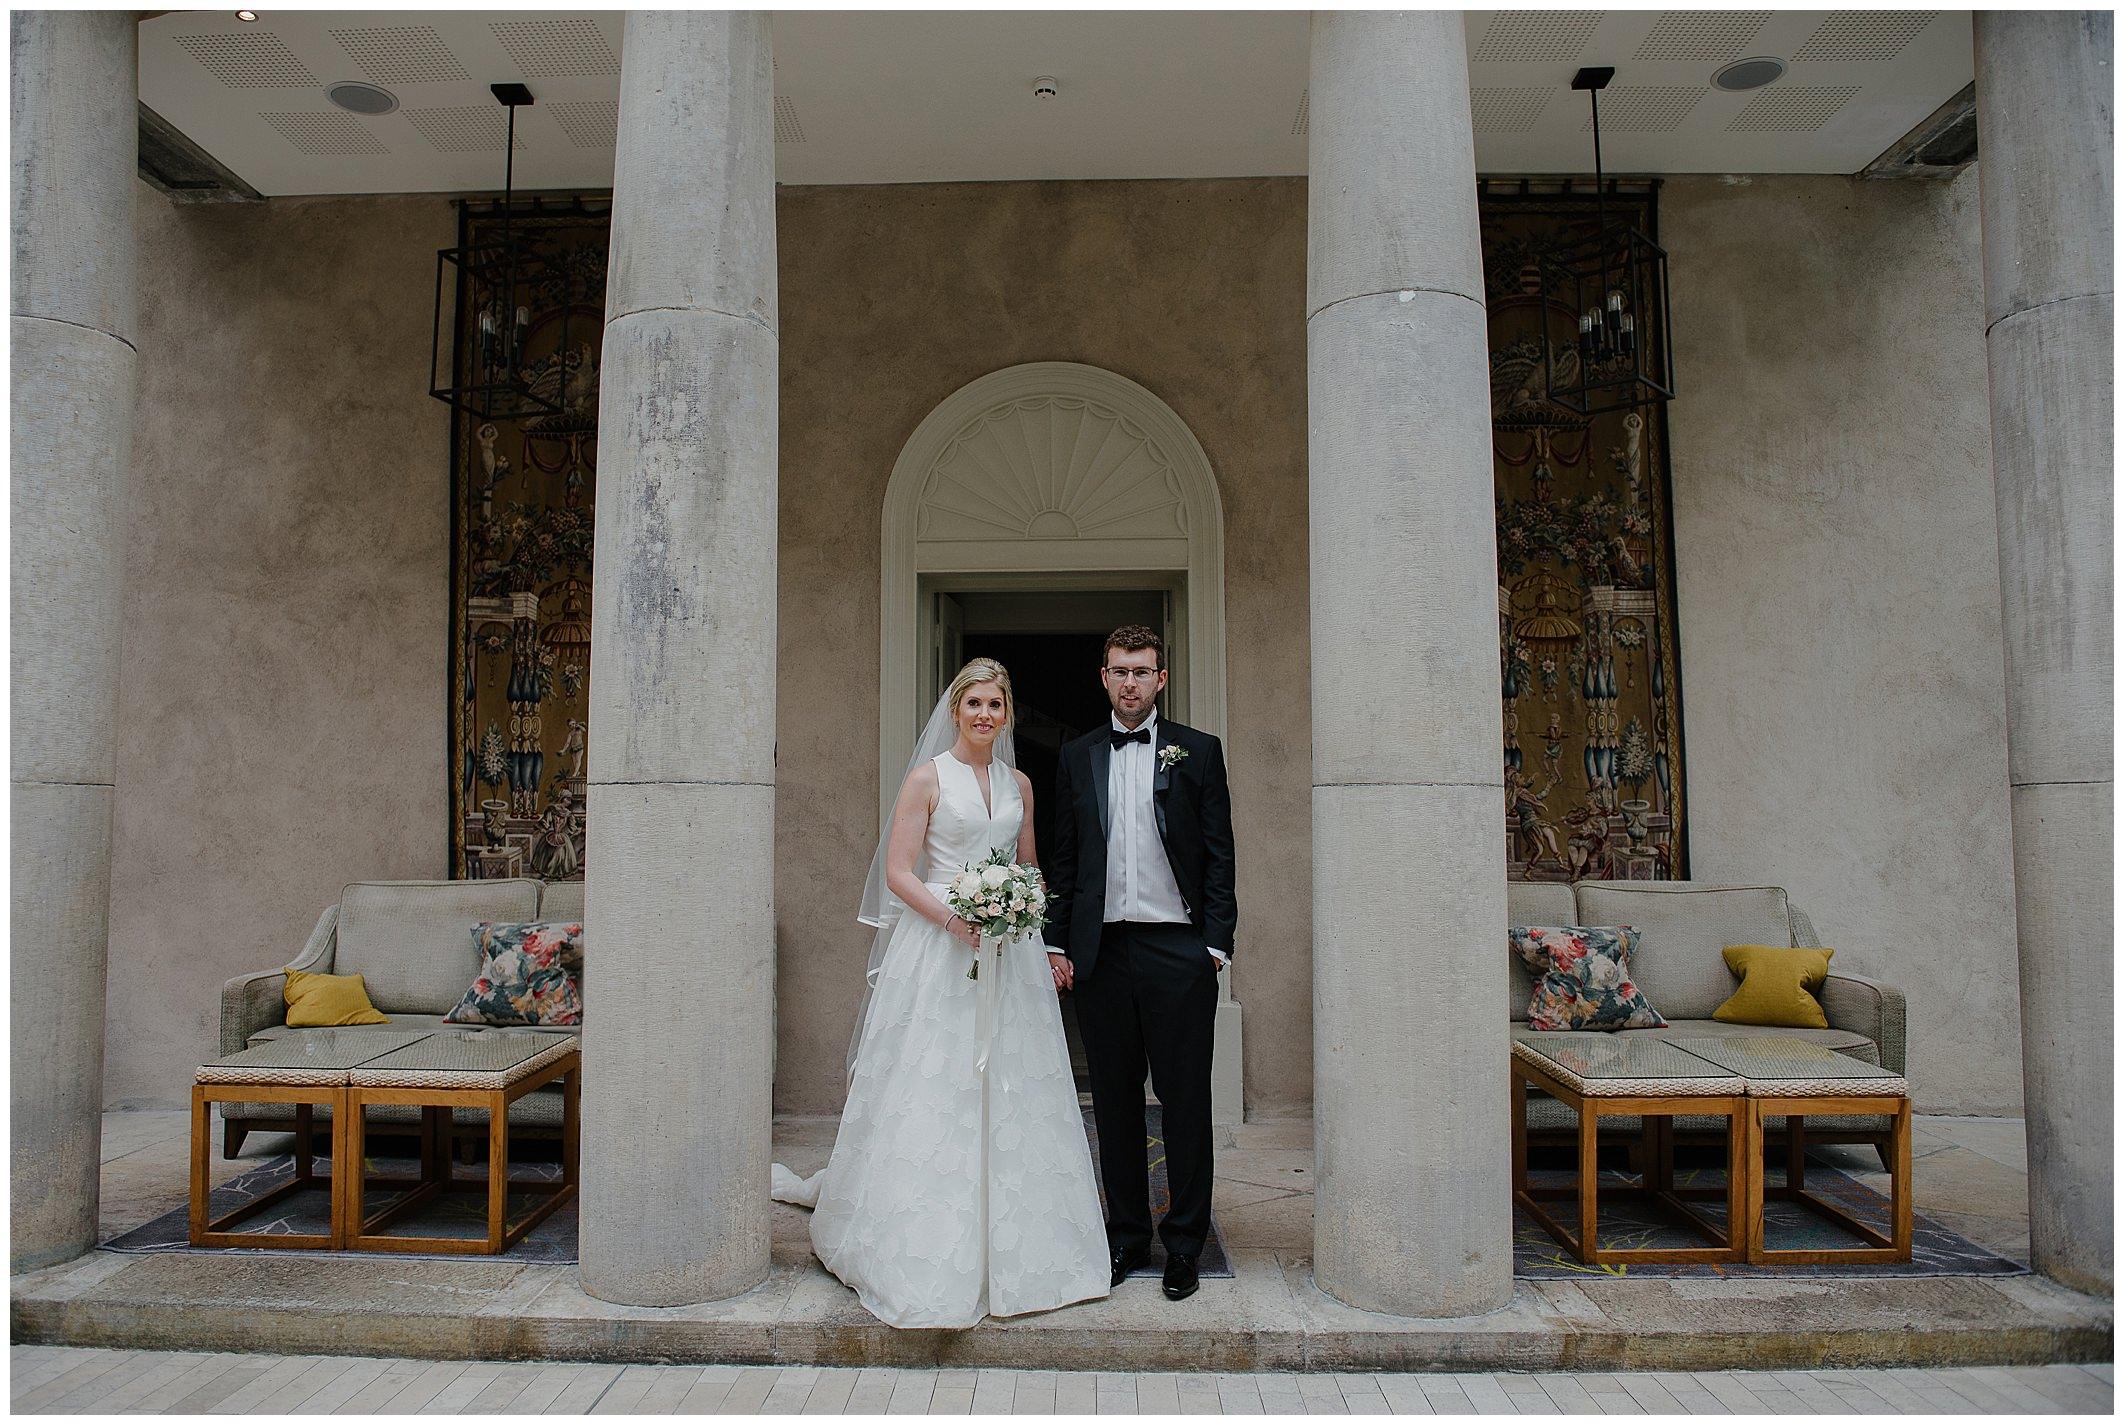 farnham-estate-wedding-jude-browne-photography_0148.jpg